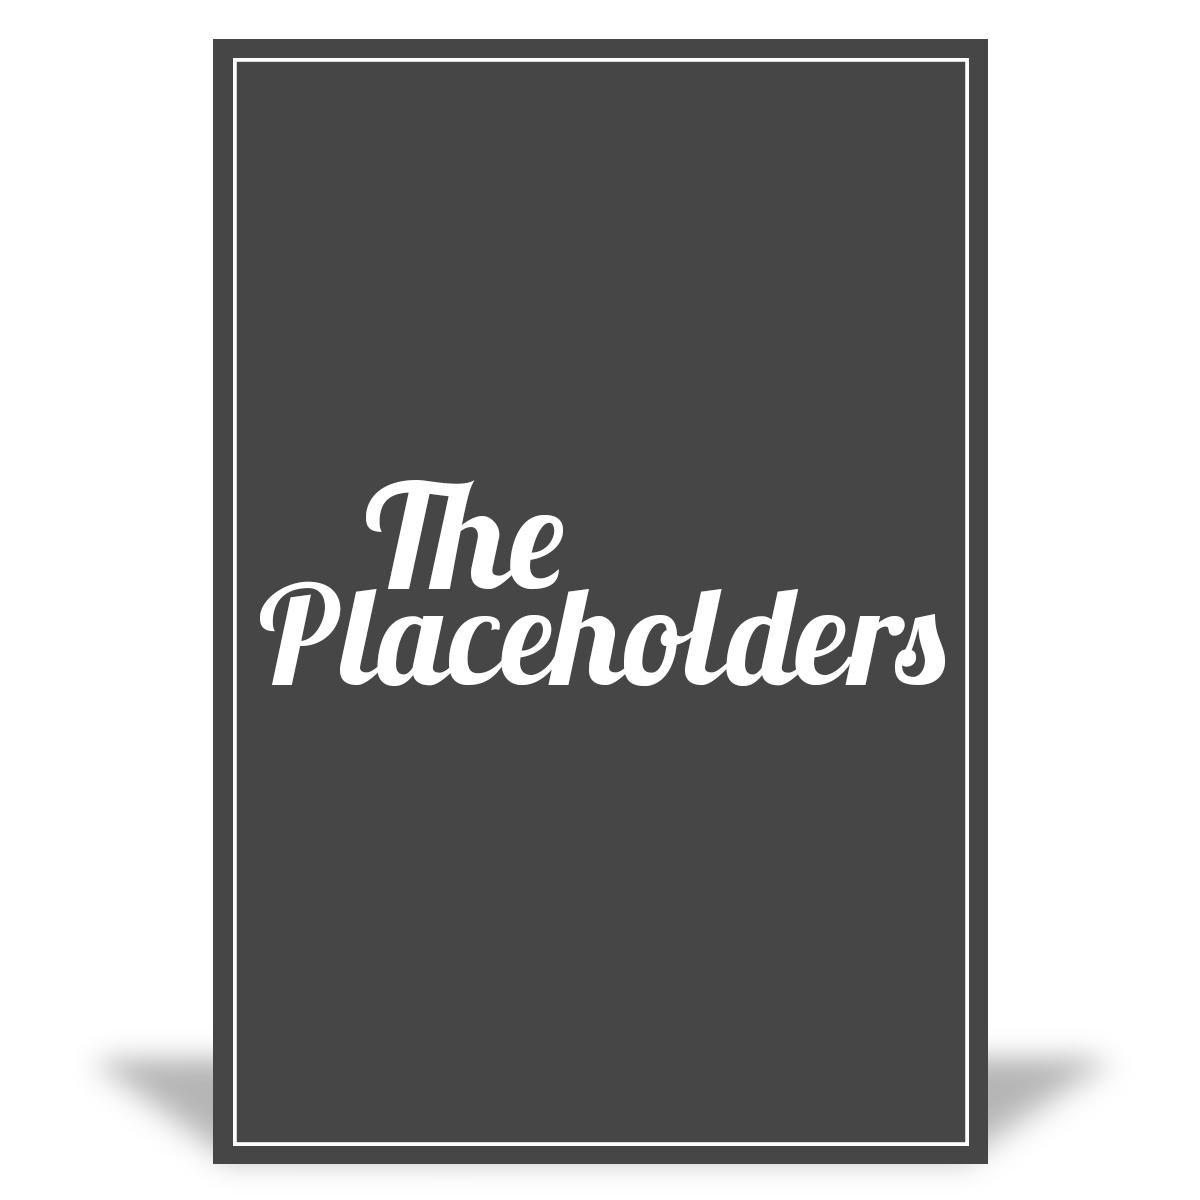 Placeholder Test Litho